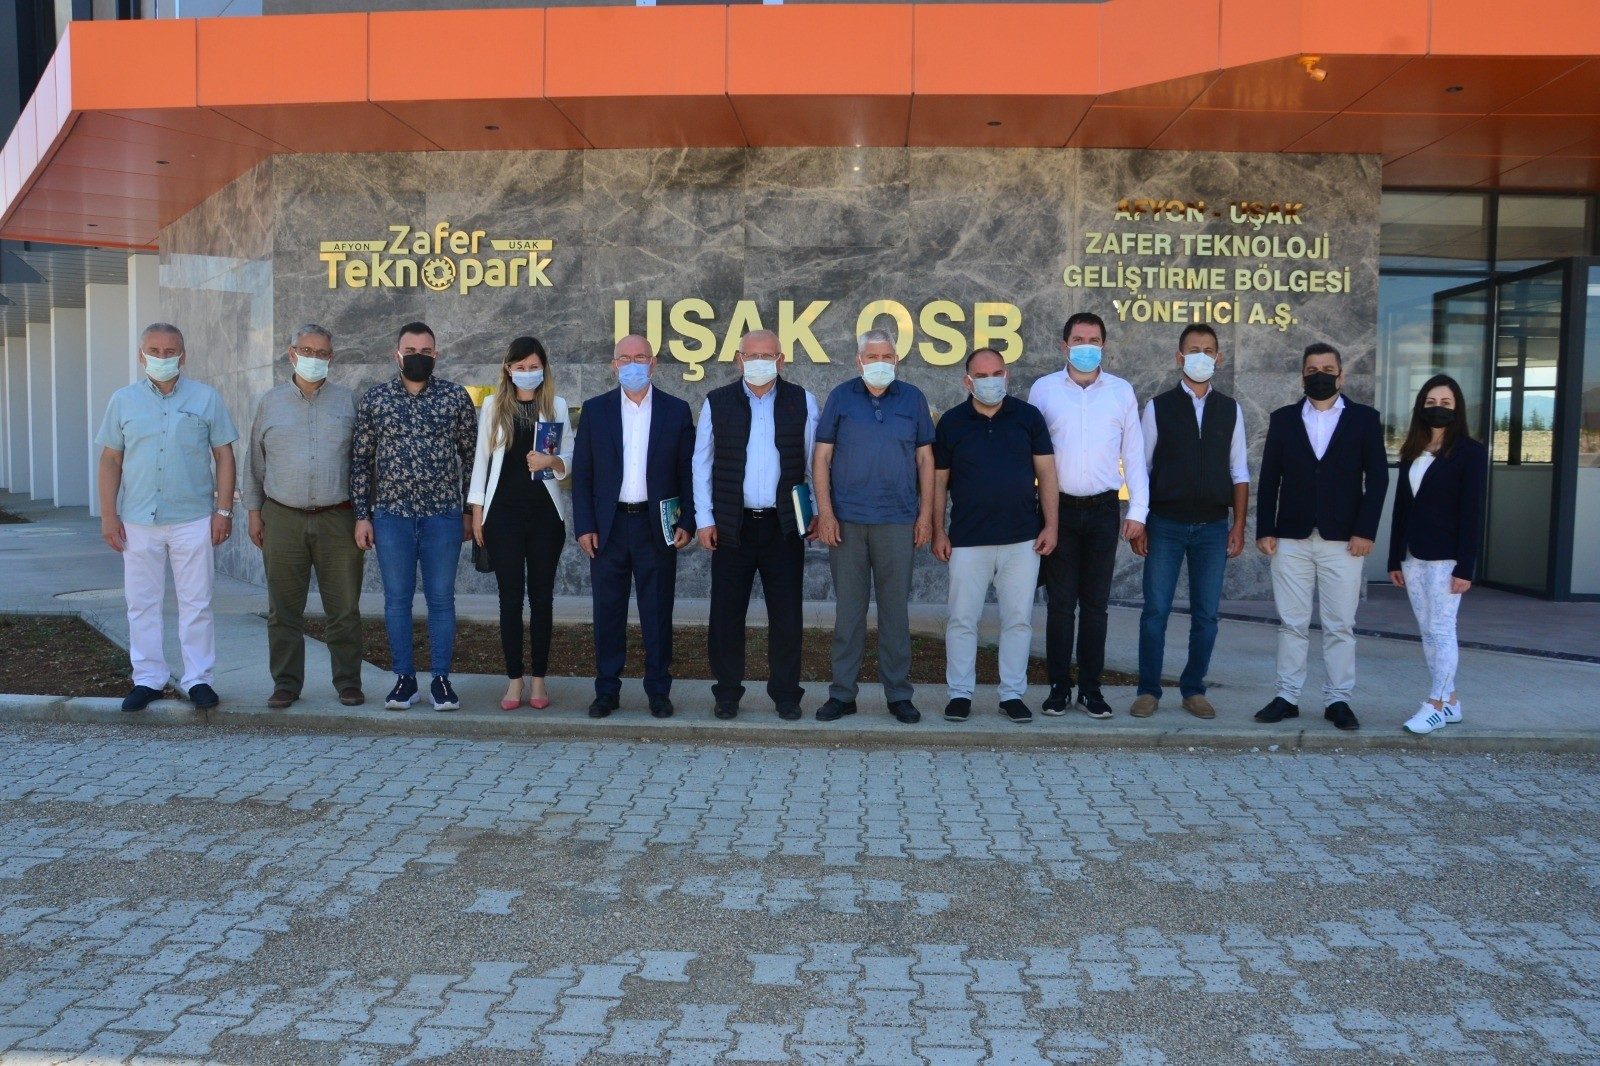 MÜSİAD'dan Uşak OSB Teknopark'a Ziyaret